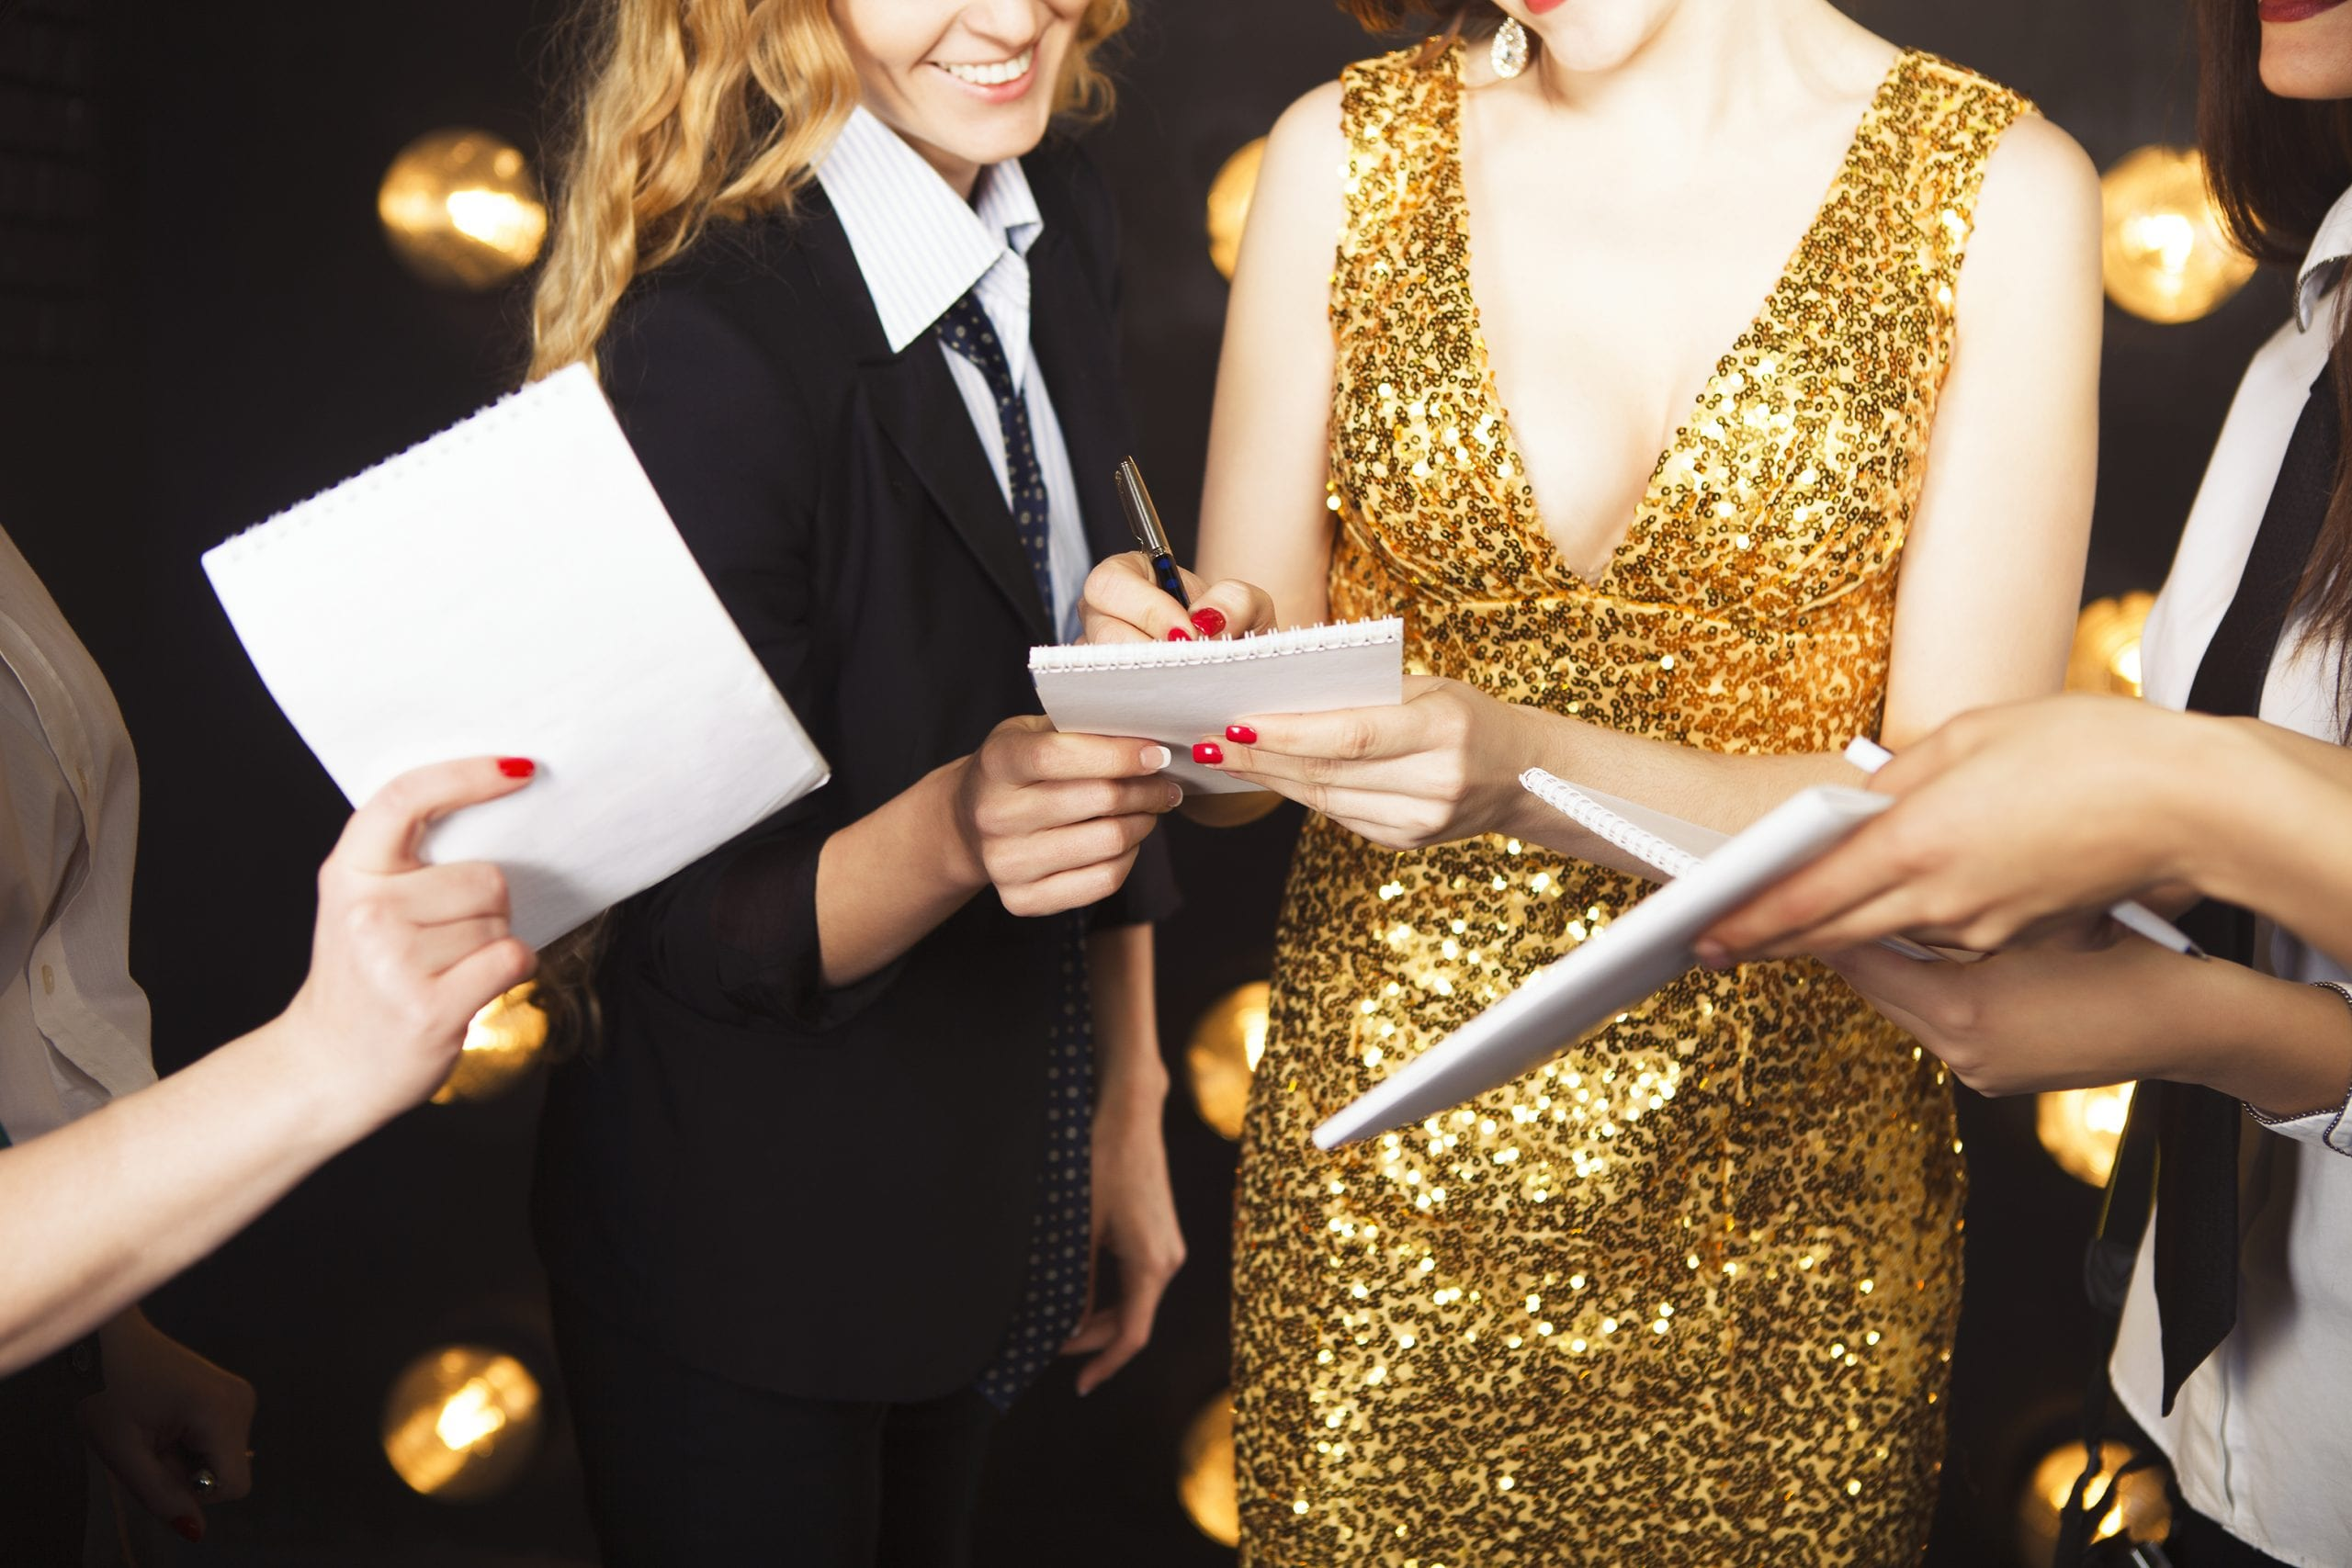 Superstar woman wearing golden shining dress crowded by paparazzi.